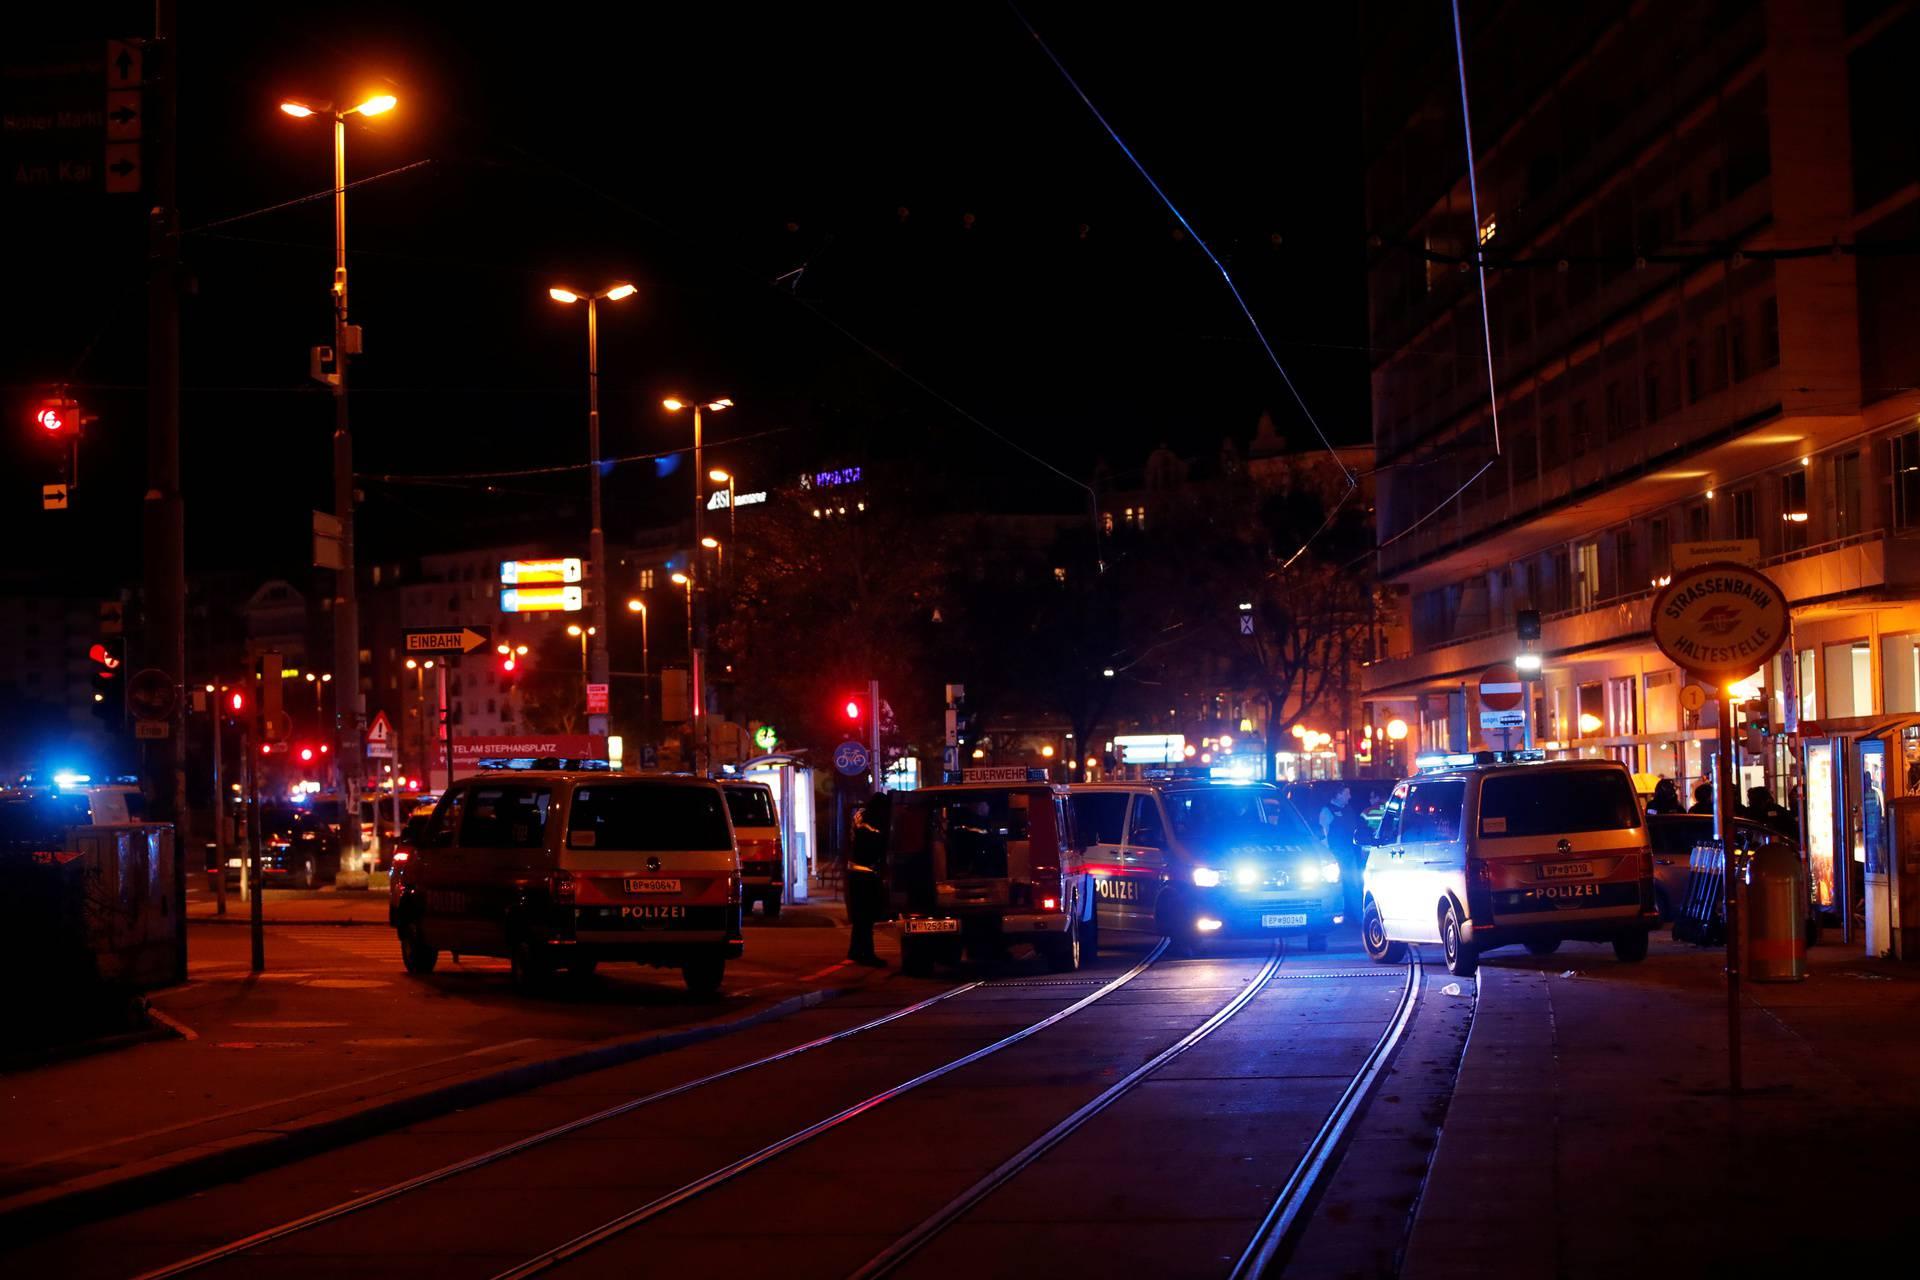 Police blocks a street near Schwedenplatz square after a shooting in Vienna